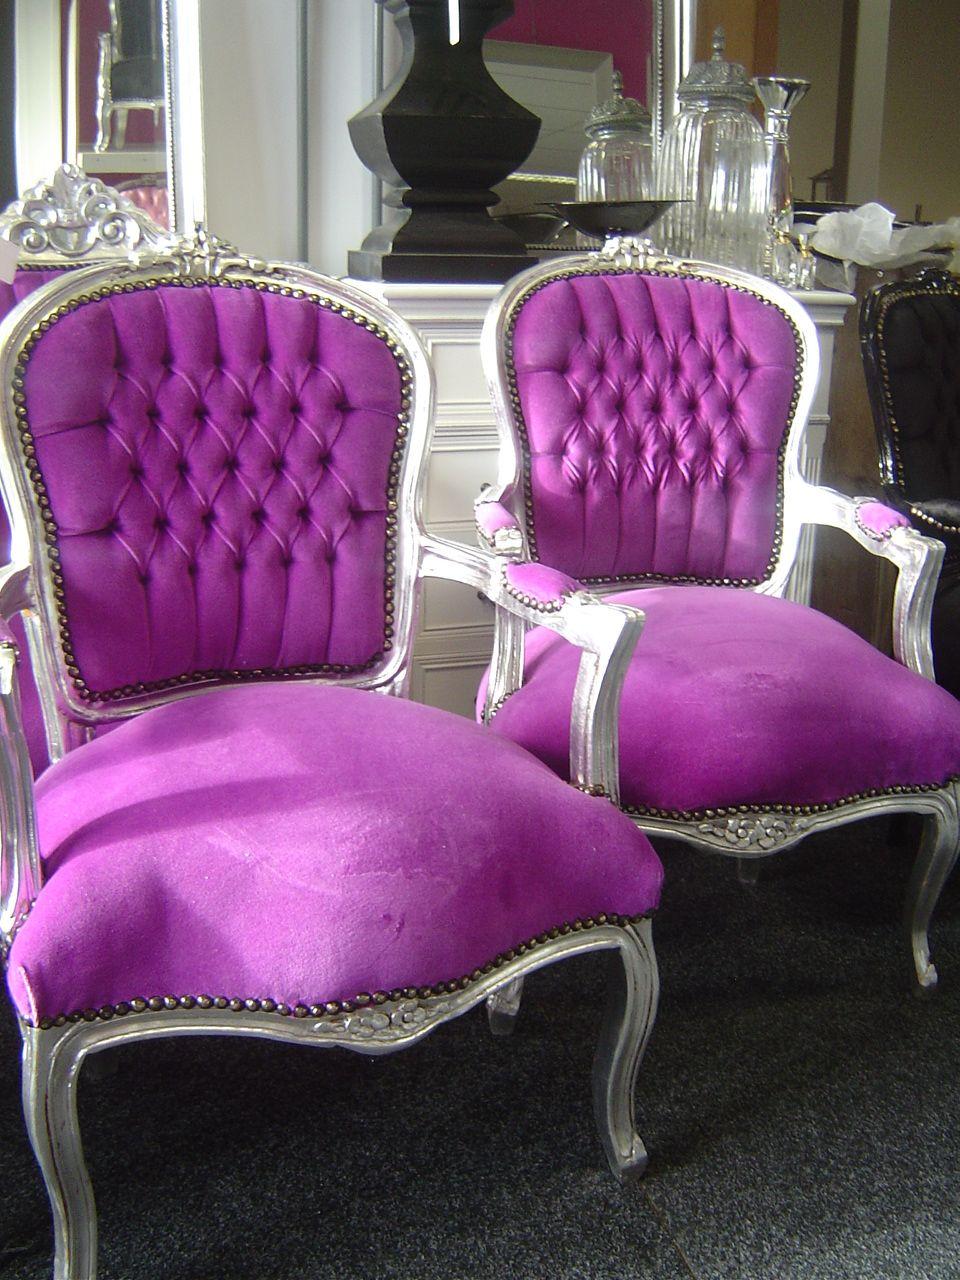 Fauteuil Barok Paars.Barok Stoelen Barok Outdoor Furniture Chairs Painted Chairs En